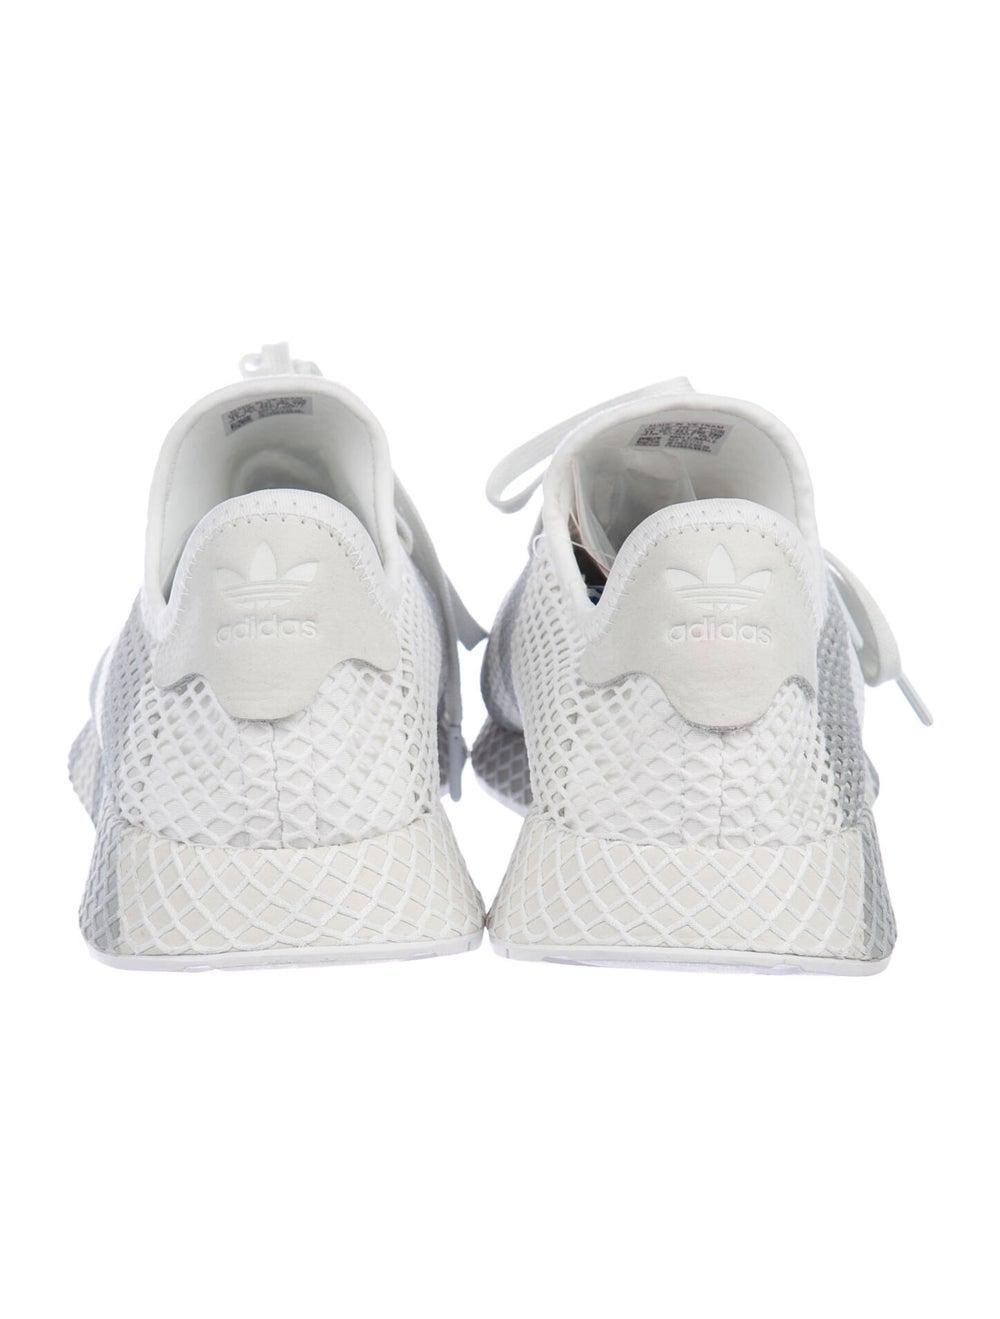 Adidas Deerupt Sneakers White - image 4